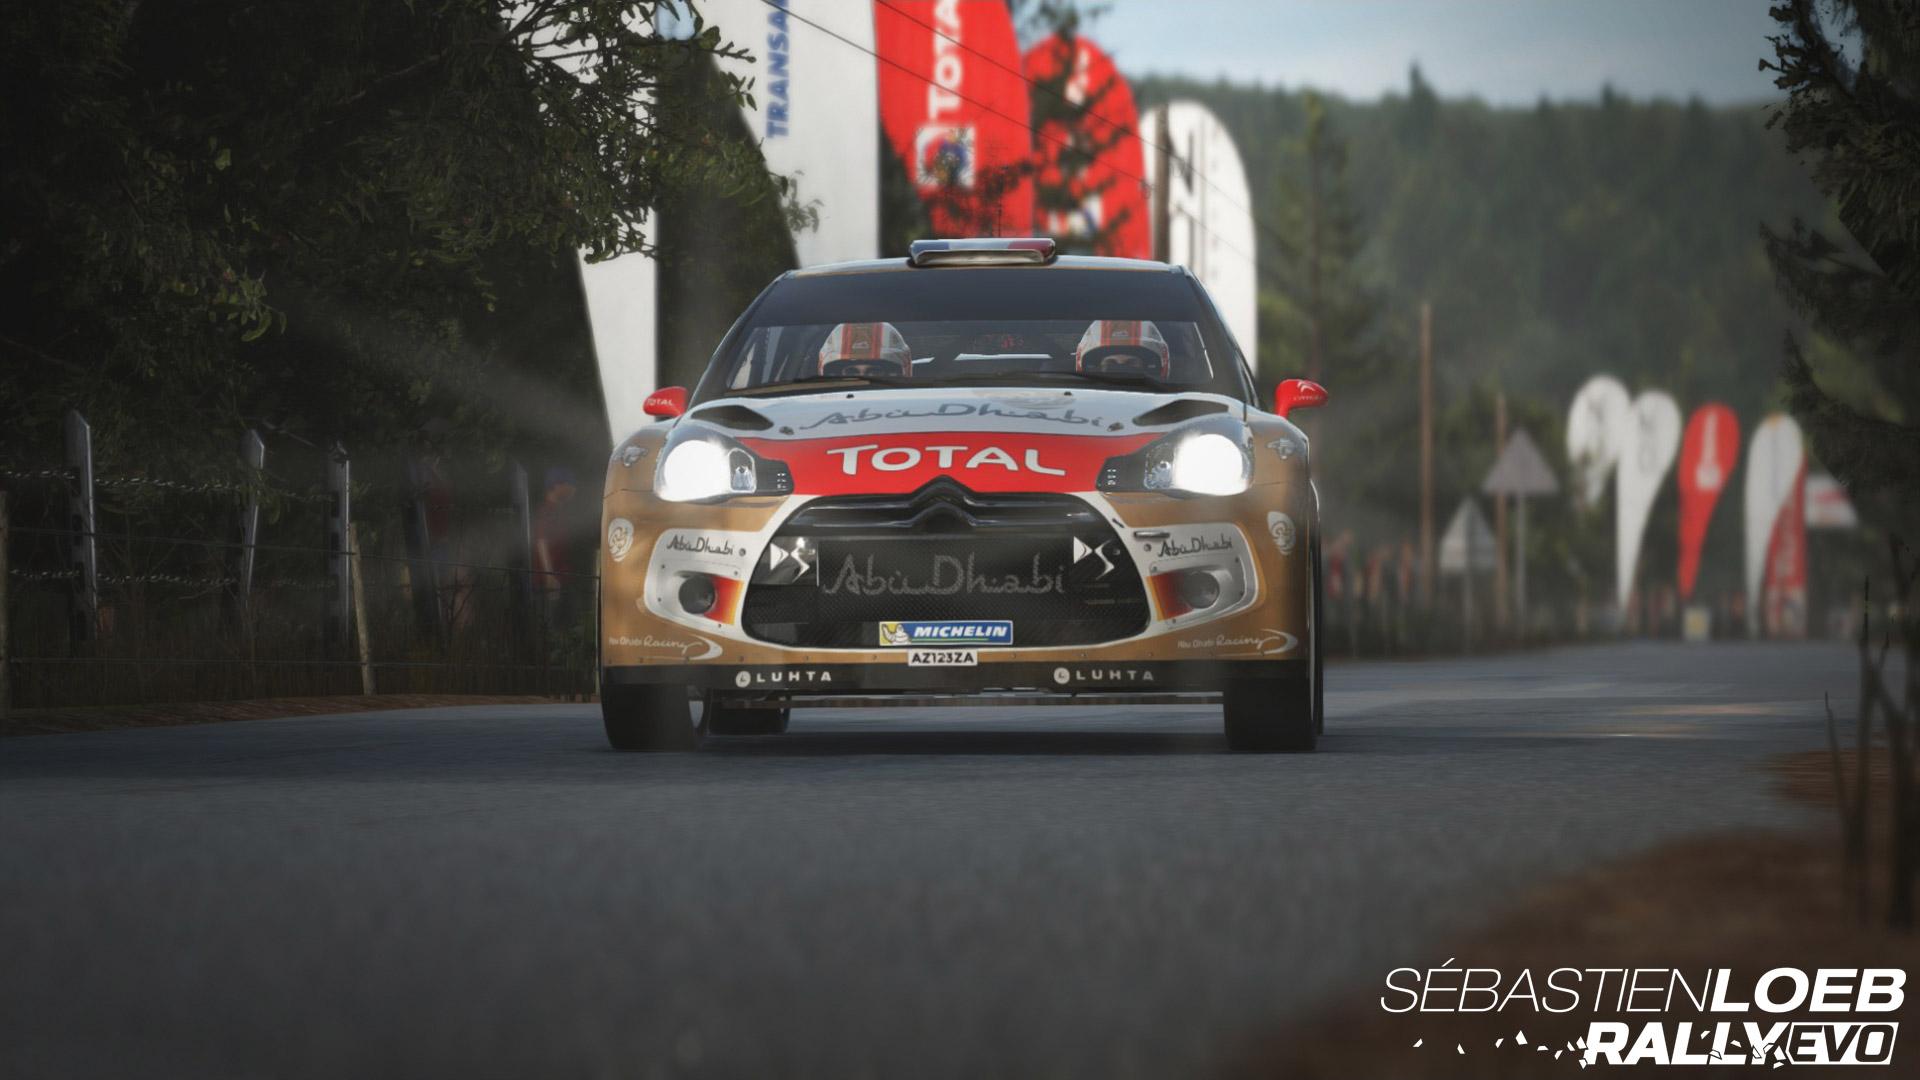 Sebastien Loeb Rally EVO Wallpaper in 1920x1080